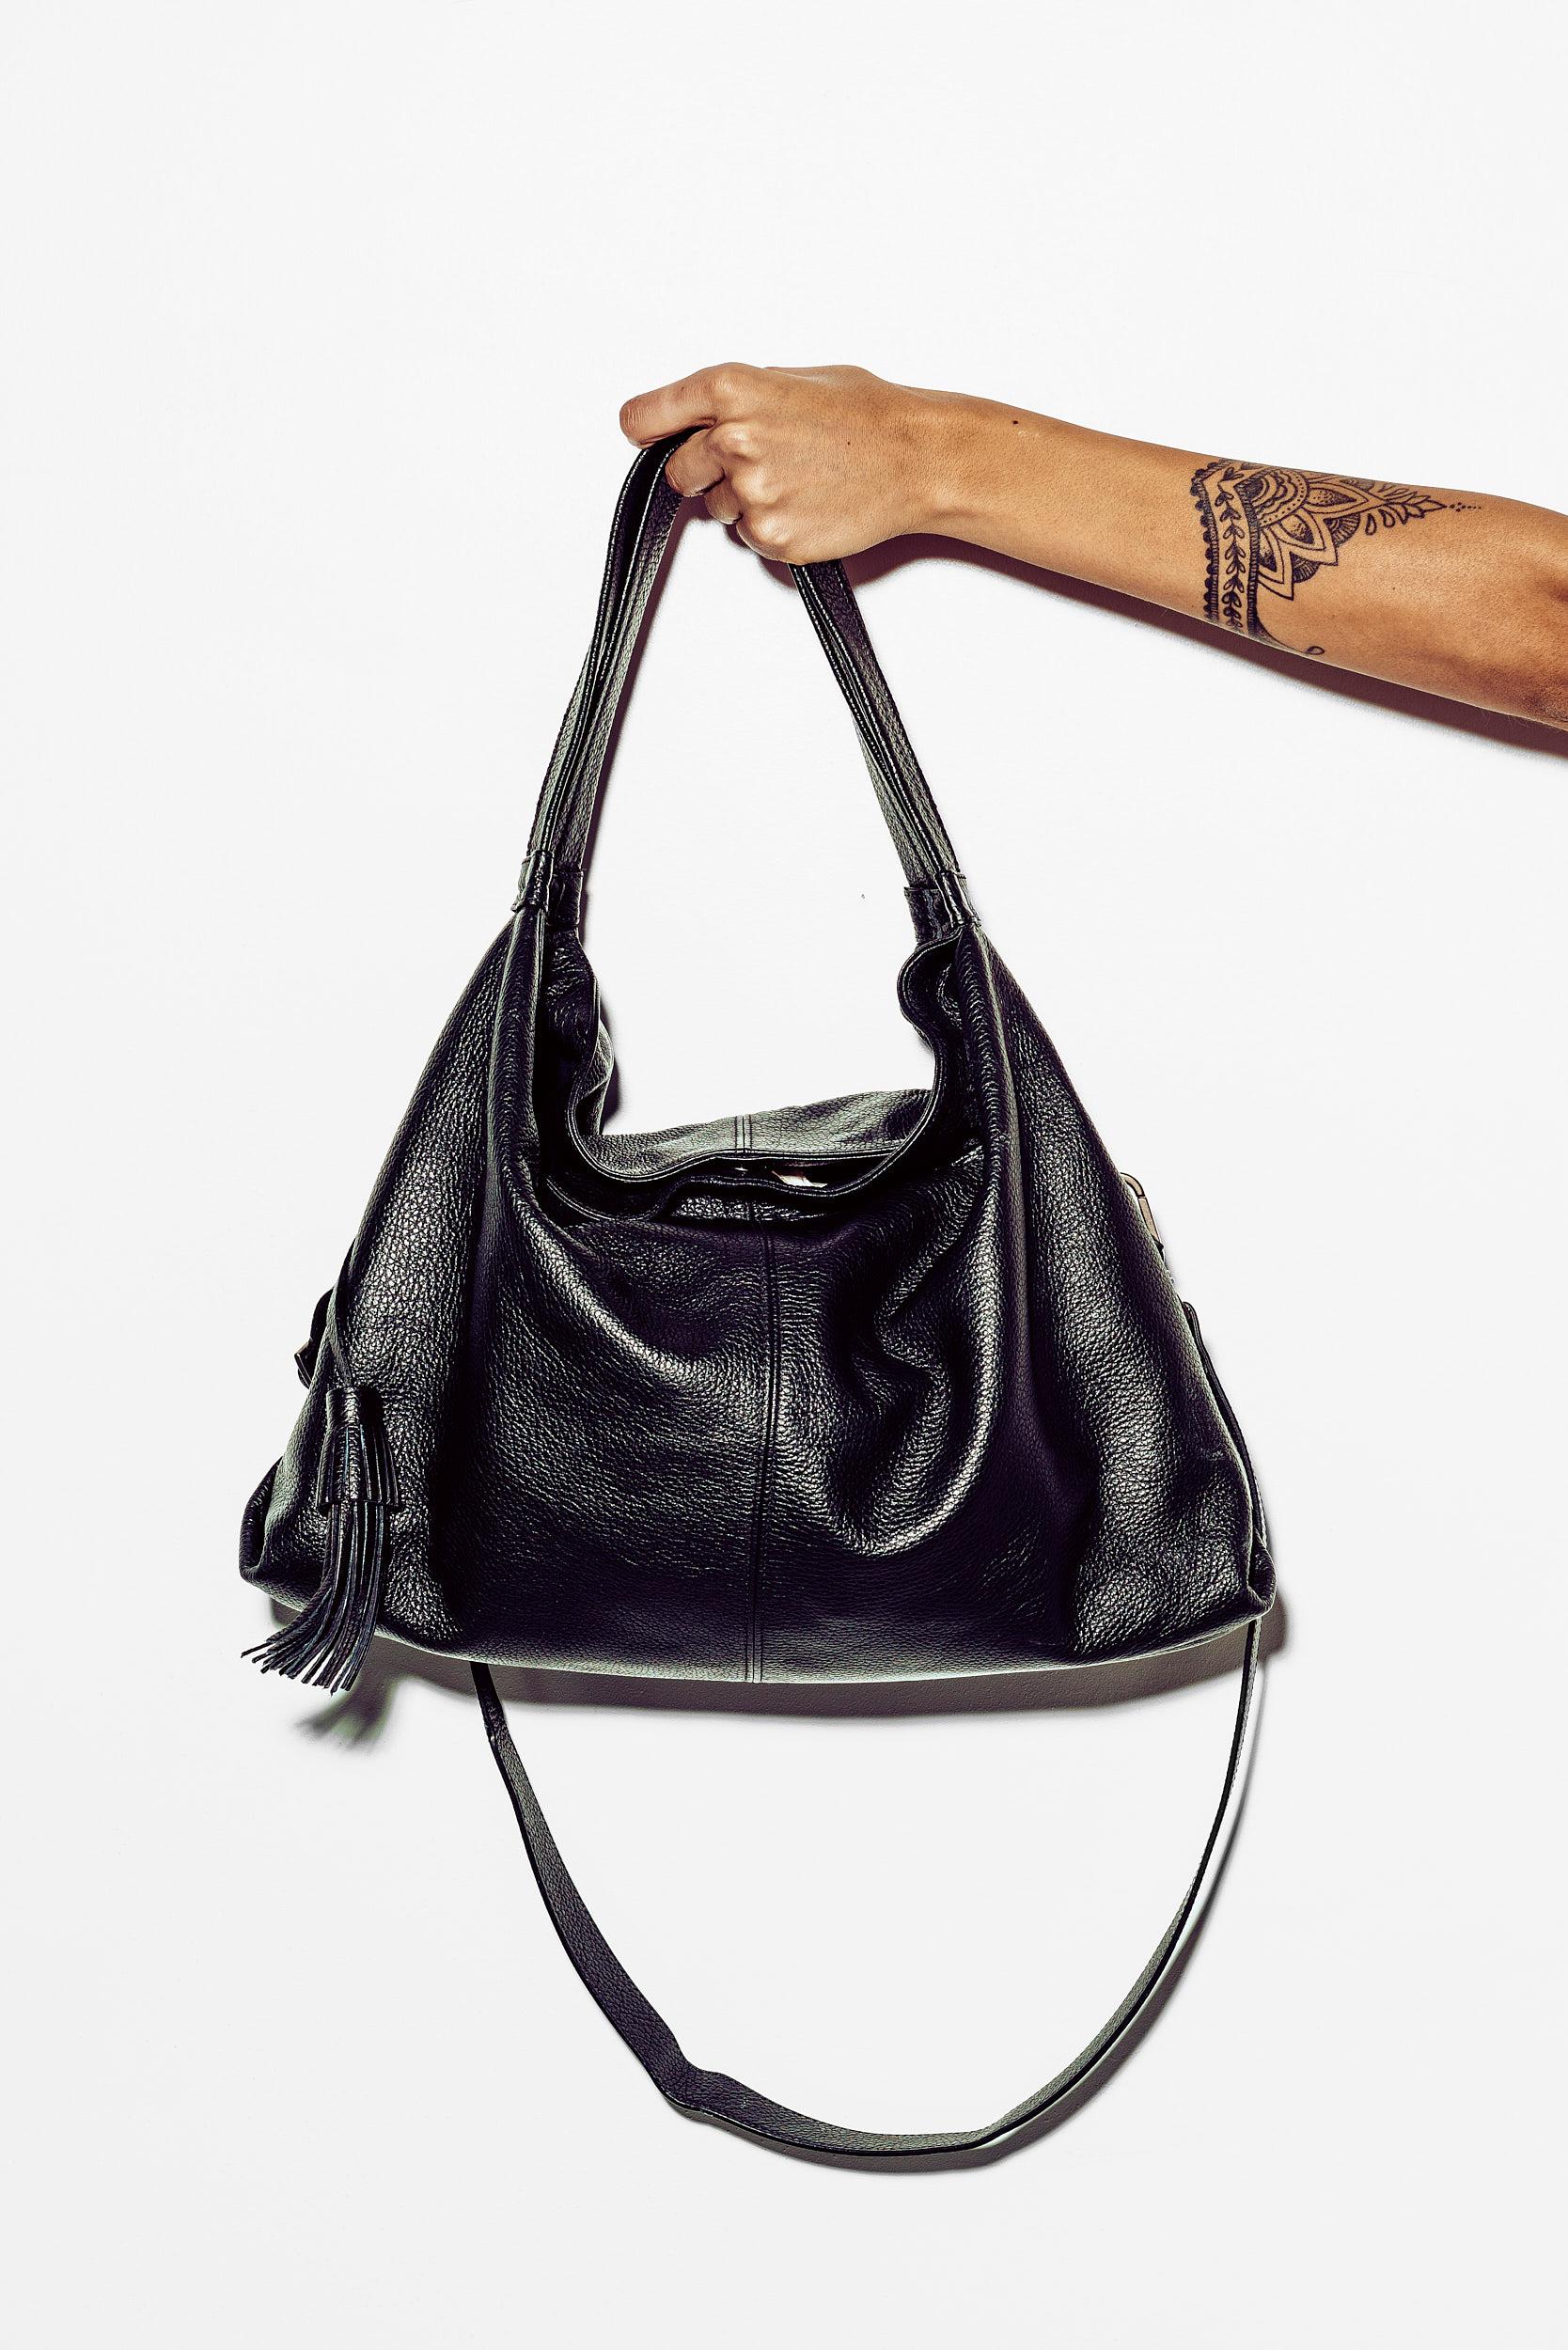 Joe Friend Photography | Fashion Photography | Isidori Handbags